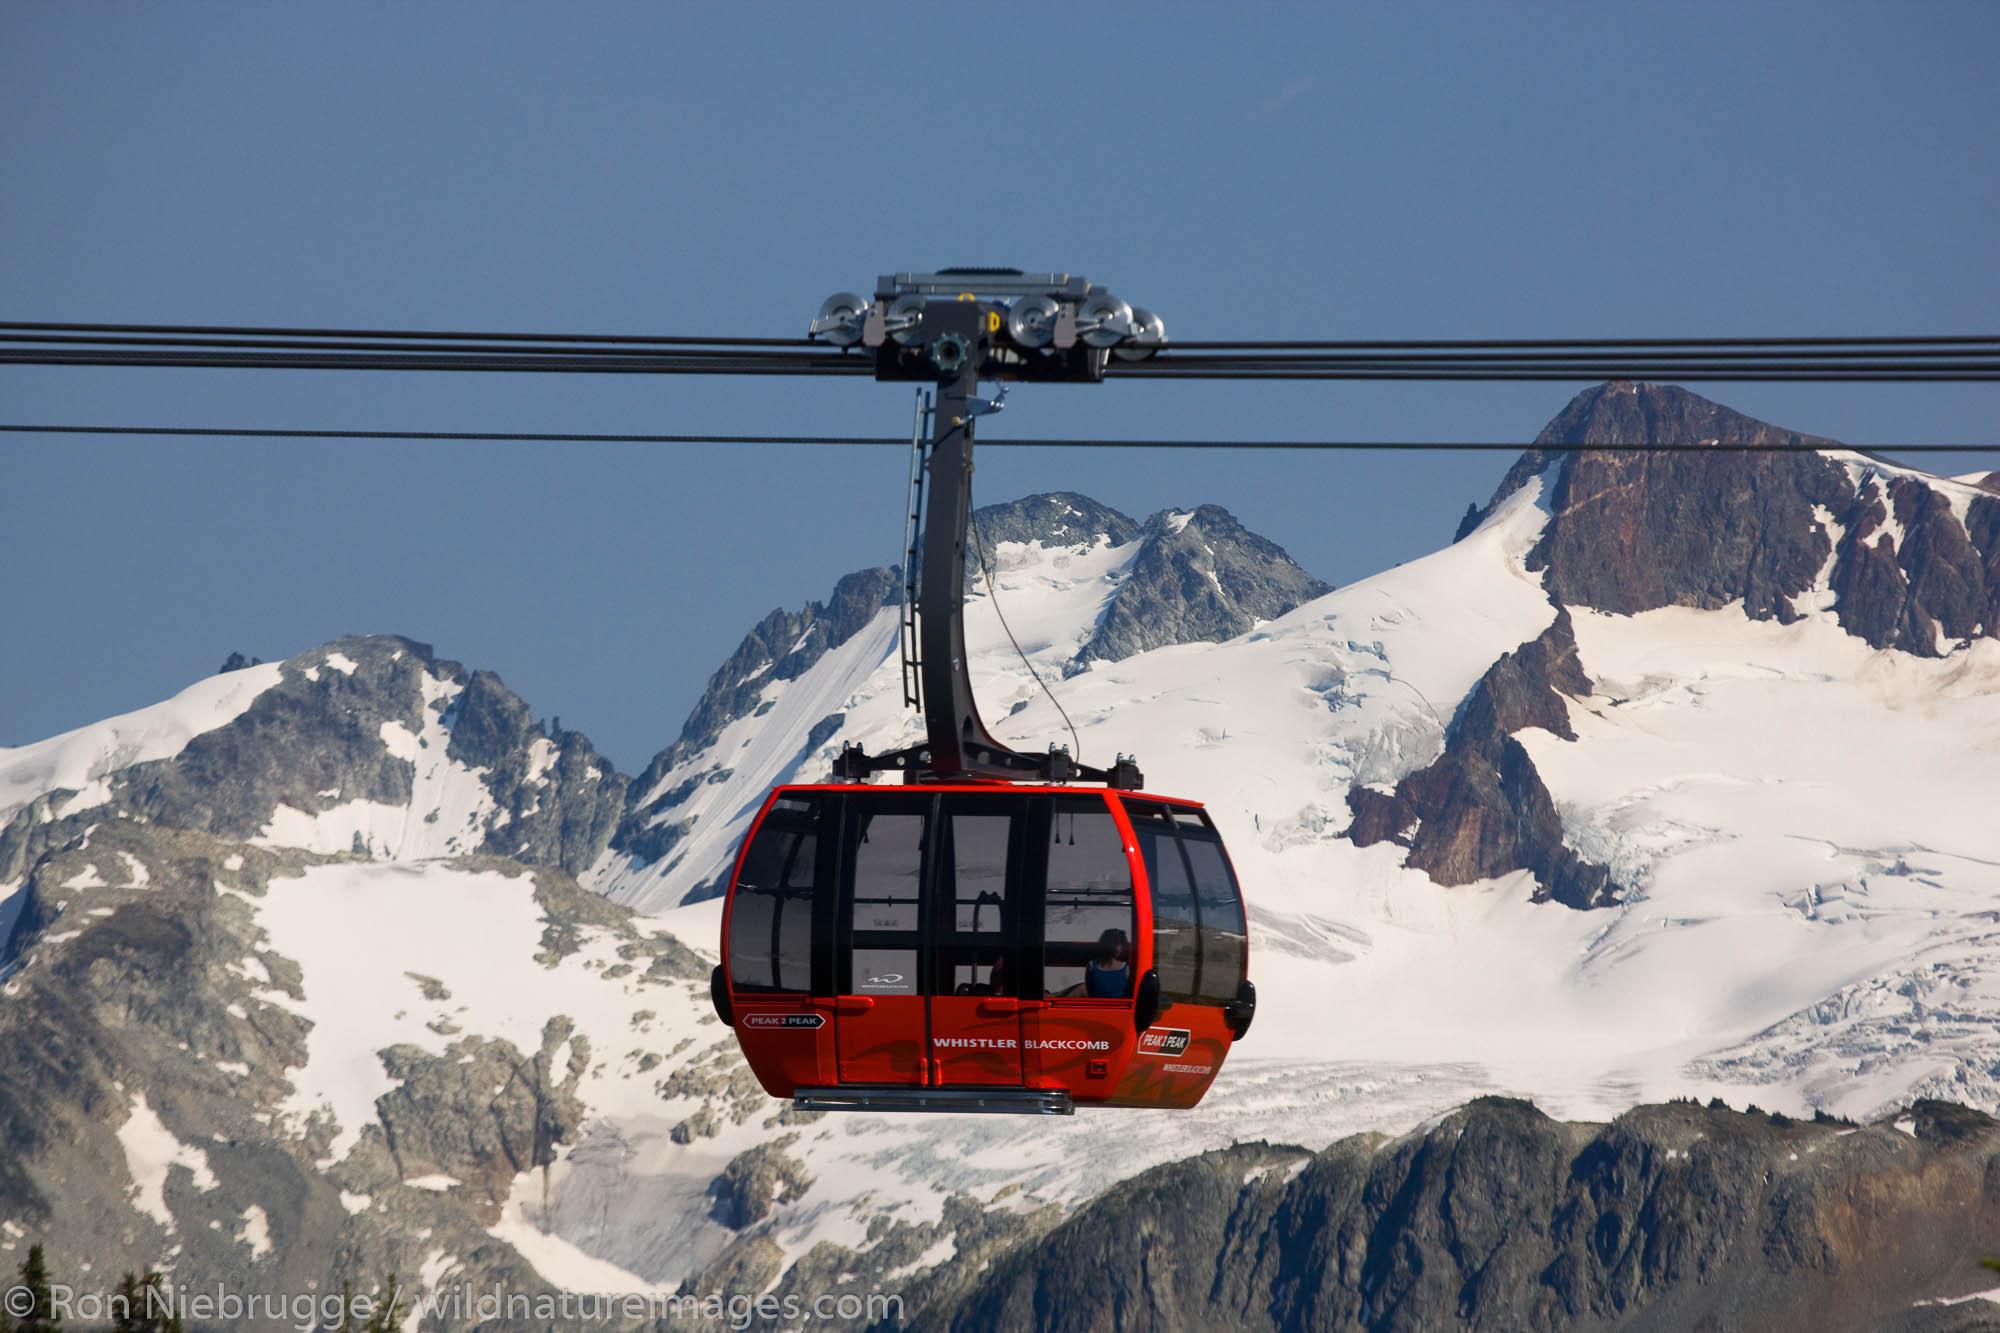 Peak 2 Peak Tram between Whistler Mountain and Blackcomb, Whistler, British Columbia, Canada.